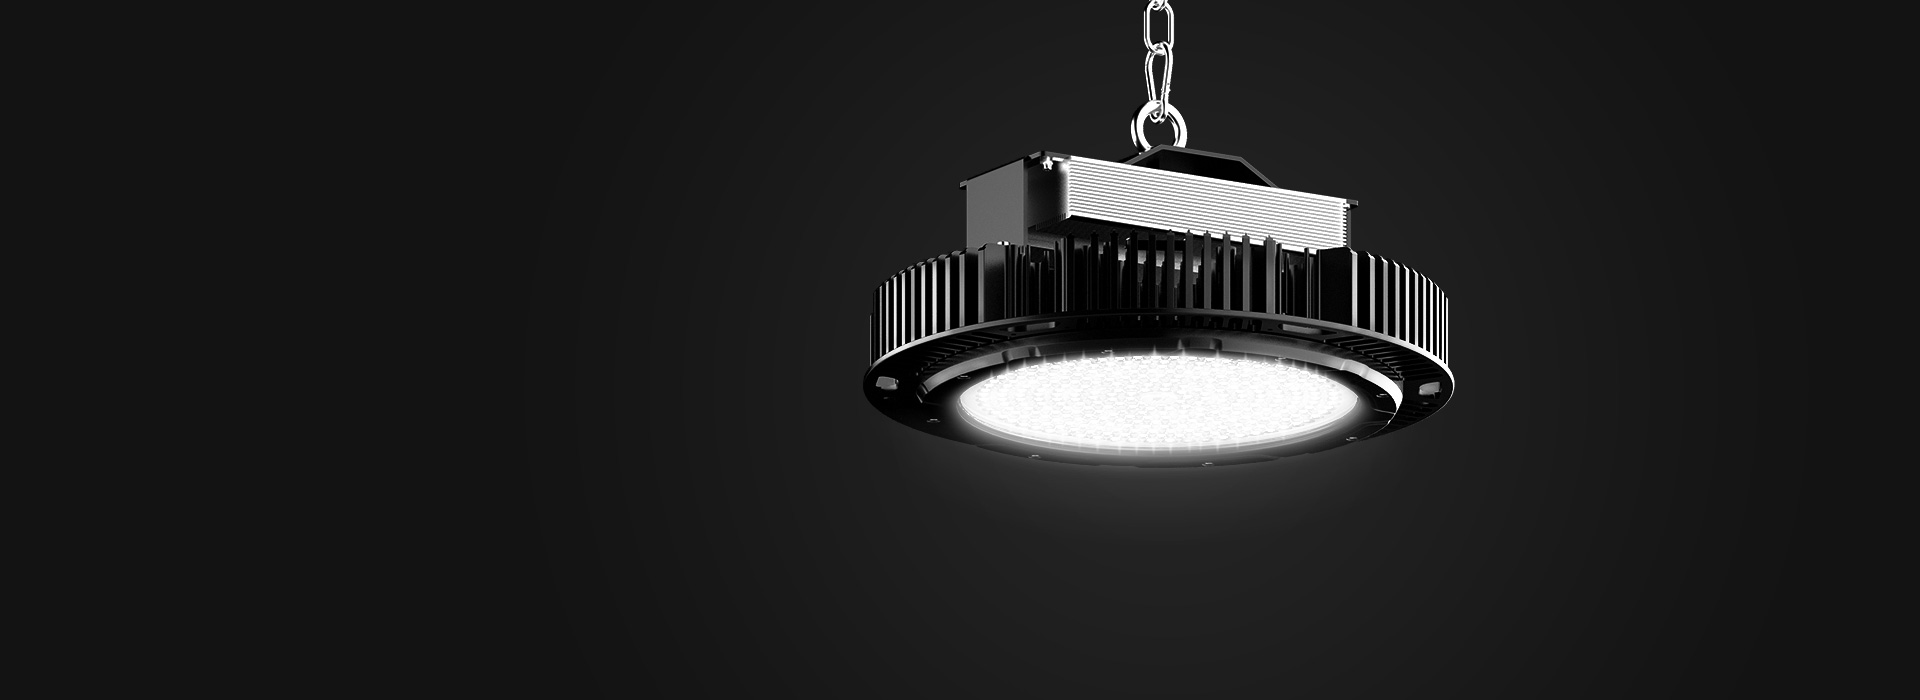 HiFar LED Flood Light & LED High Bay u0026 Street Light manufacturer - AGC Lighting azcodes.com